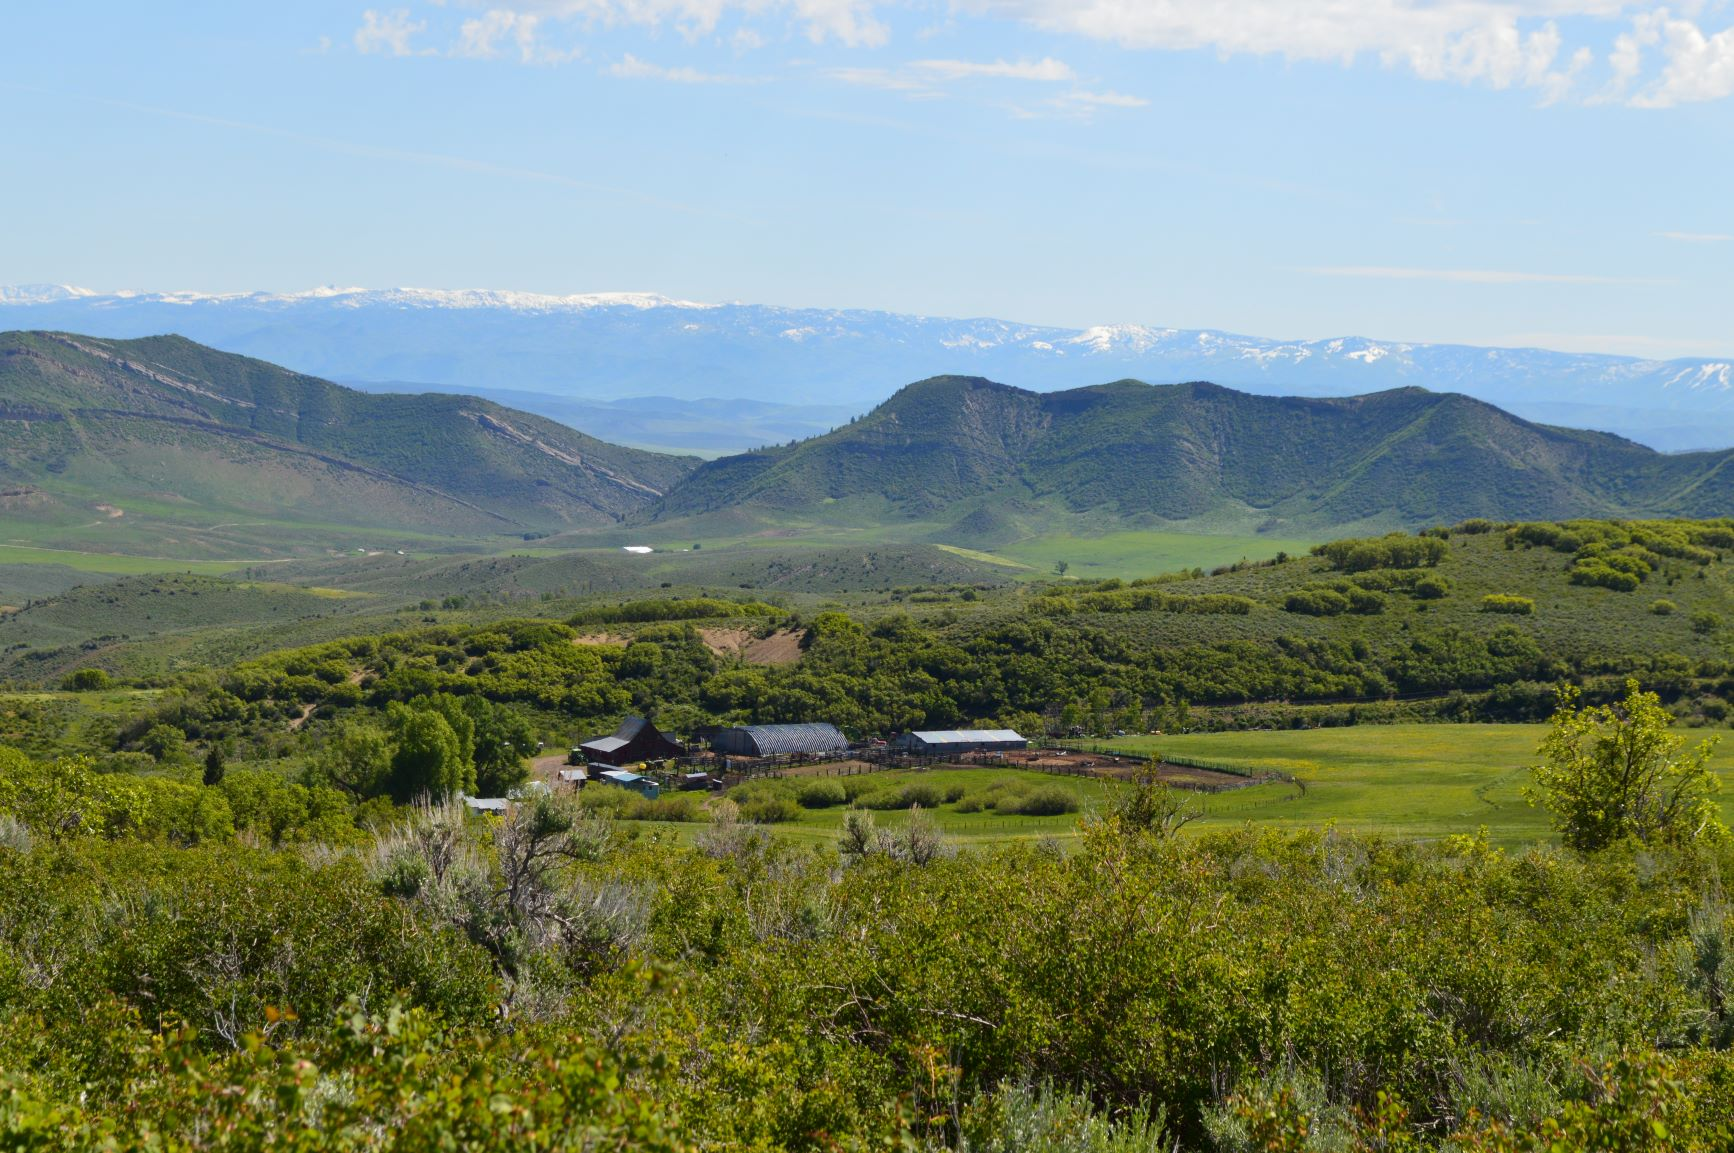 Dunckley Flattops Ranch